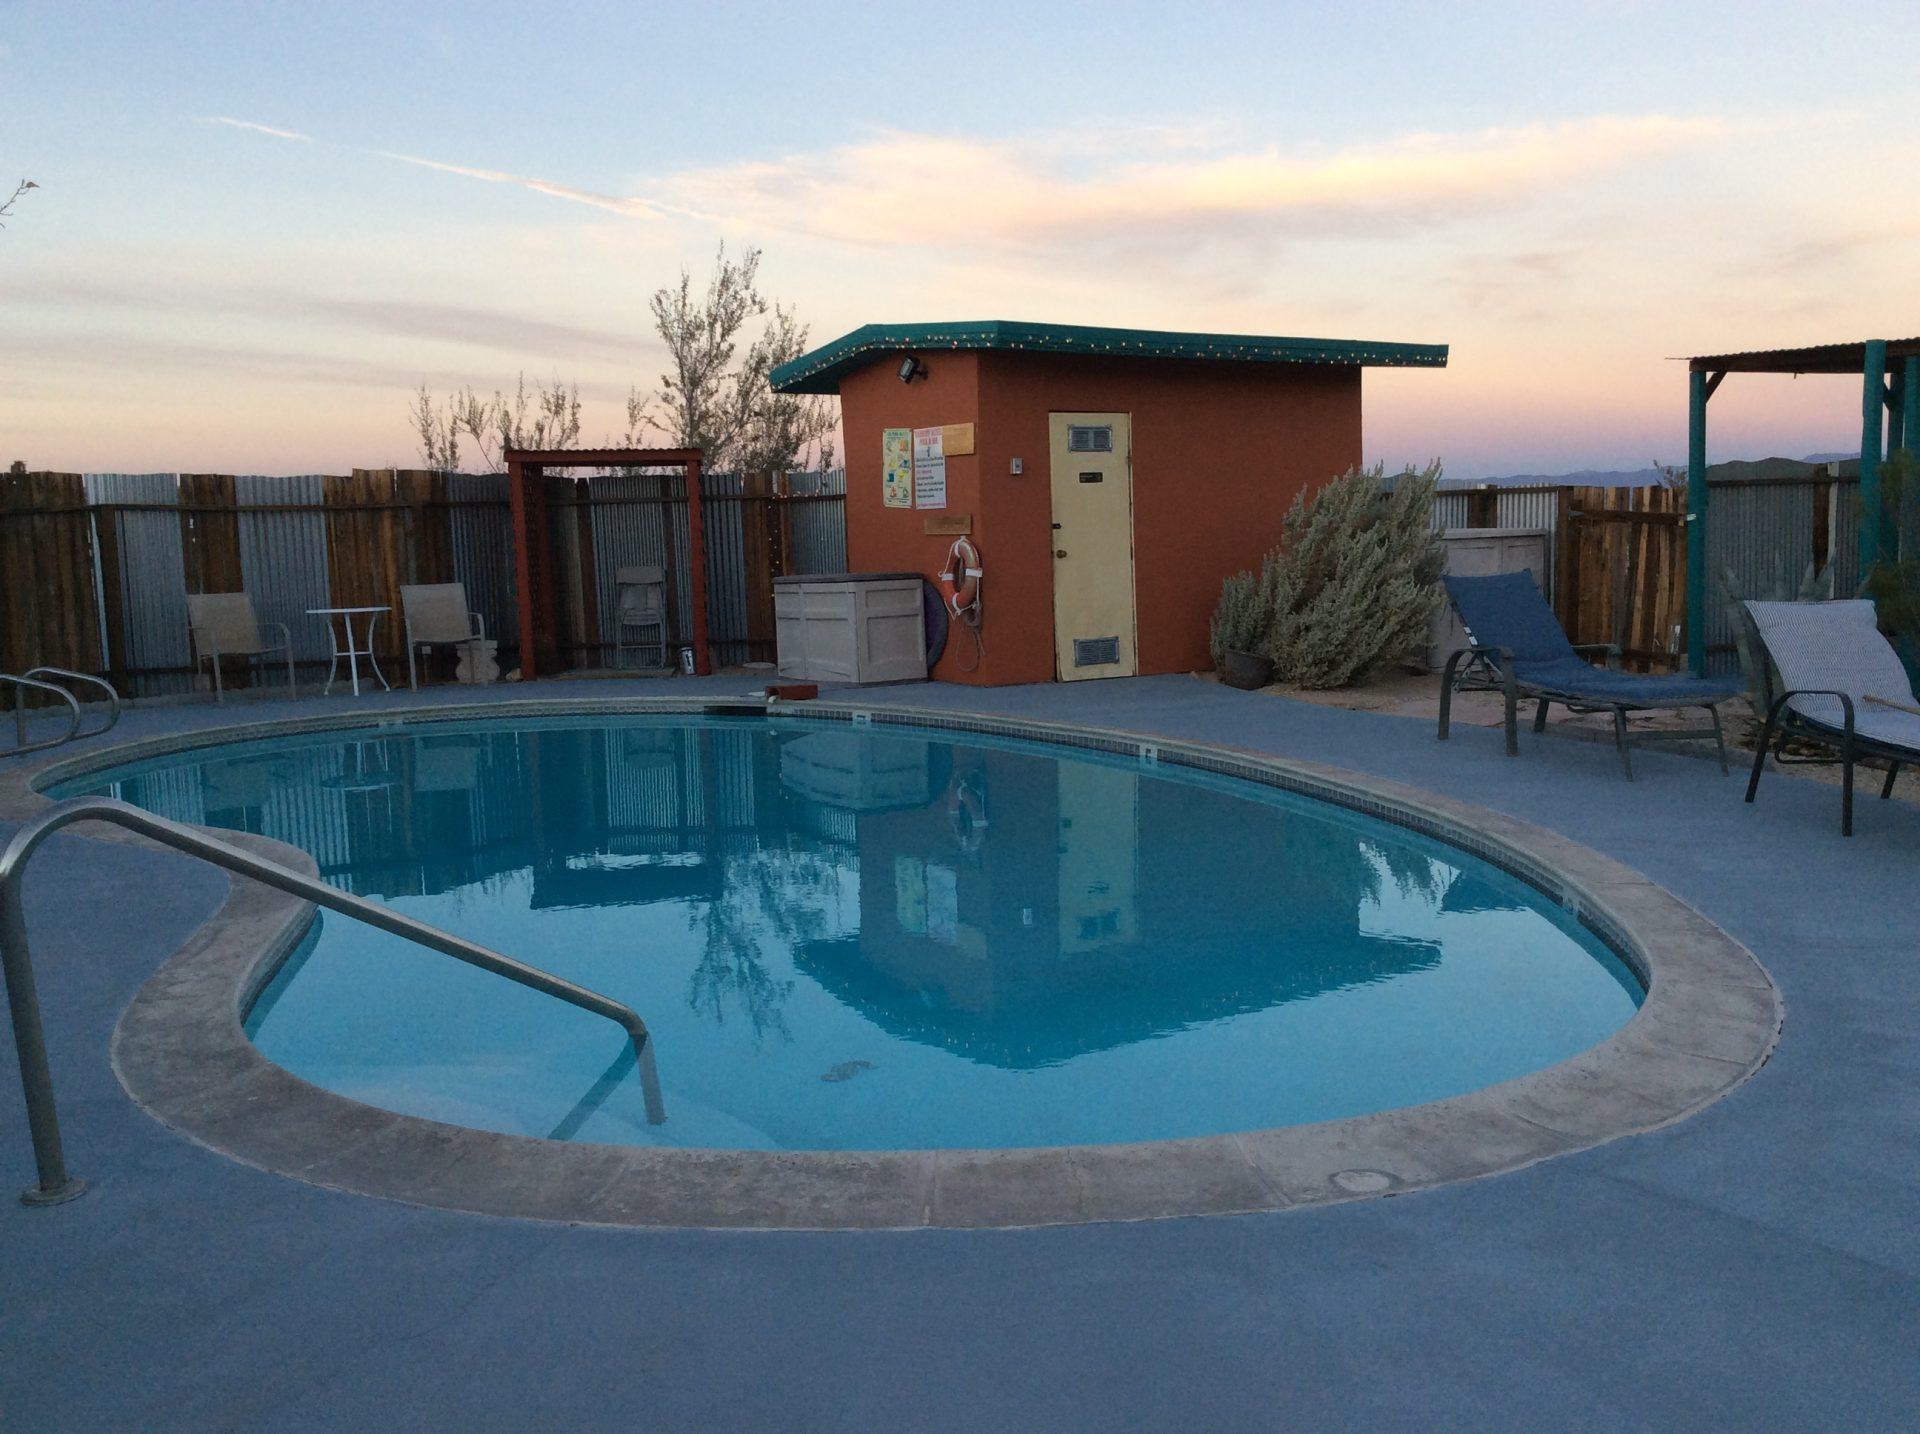 La piscina, foto di Gloria